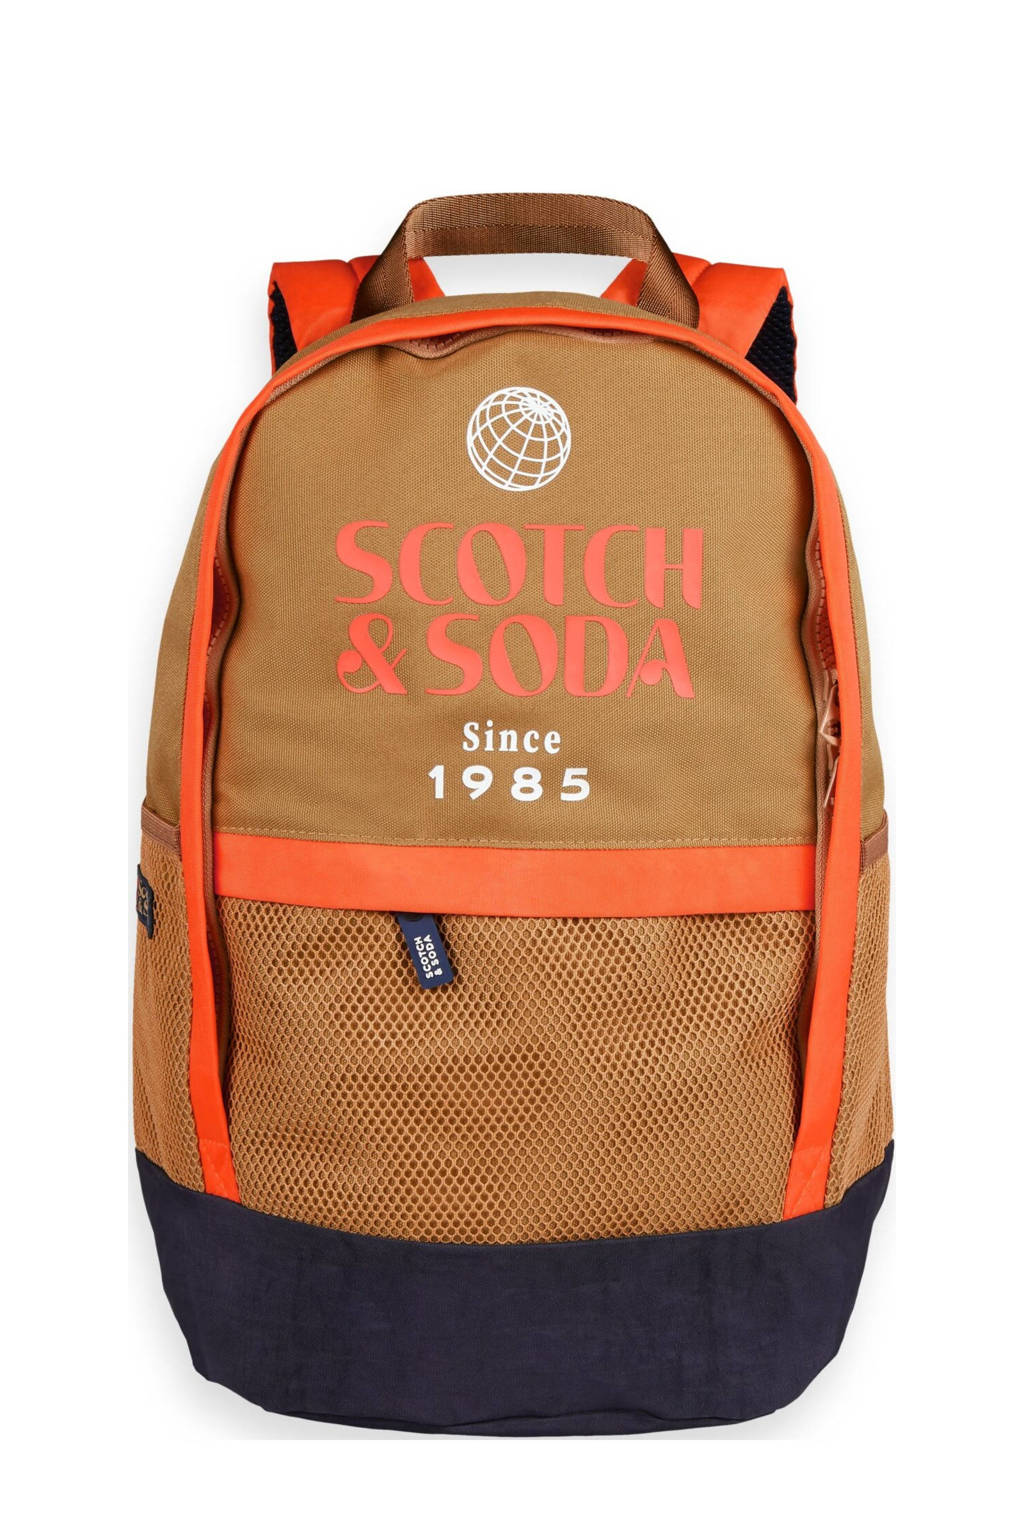 Scotch & Soda  rugzak beige/oranje, Beige/oranje